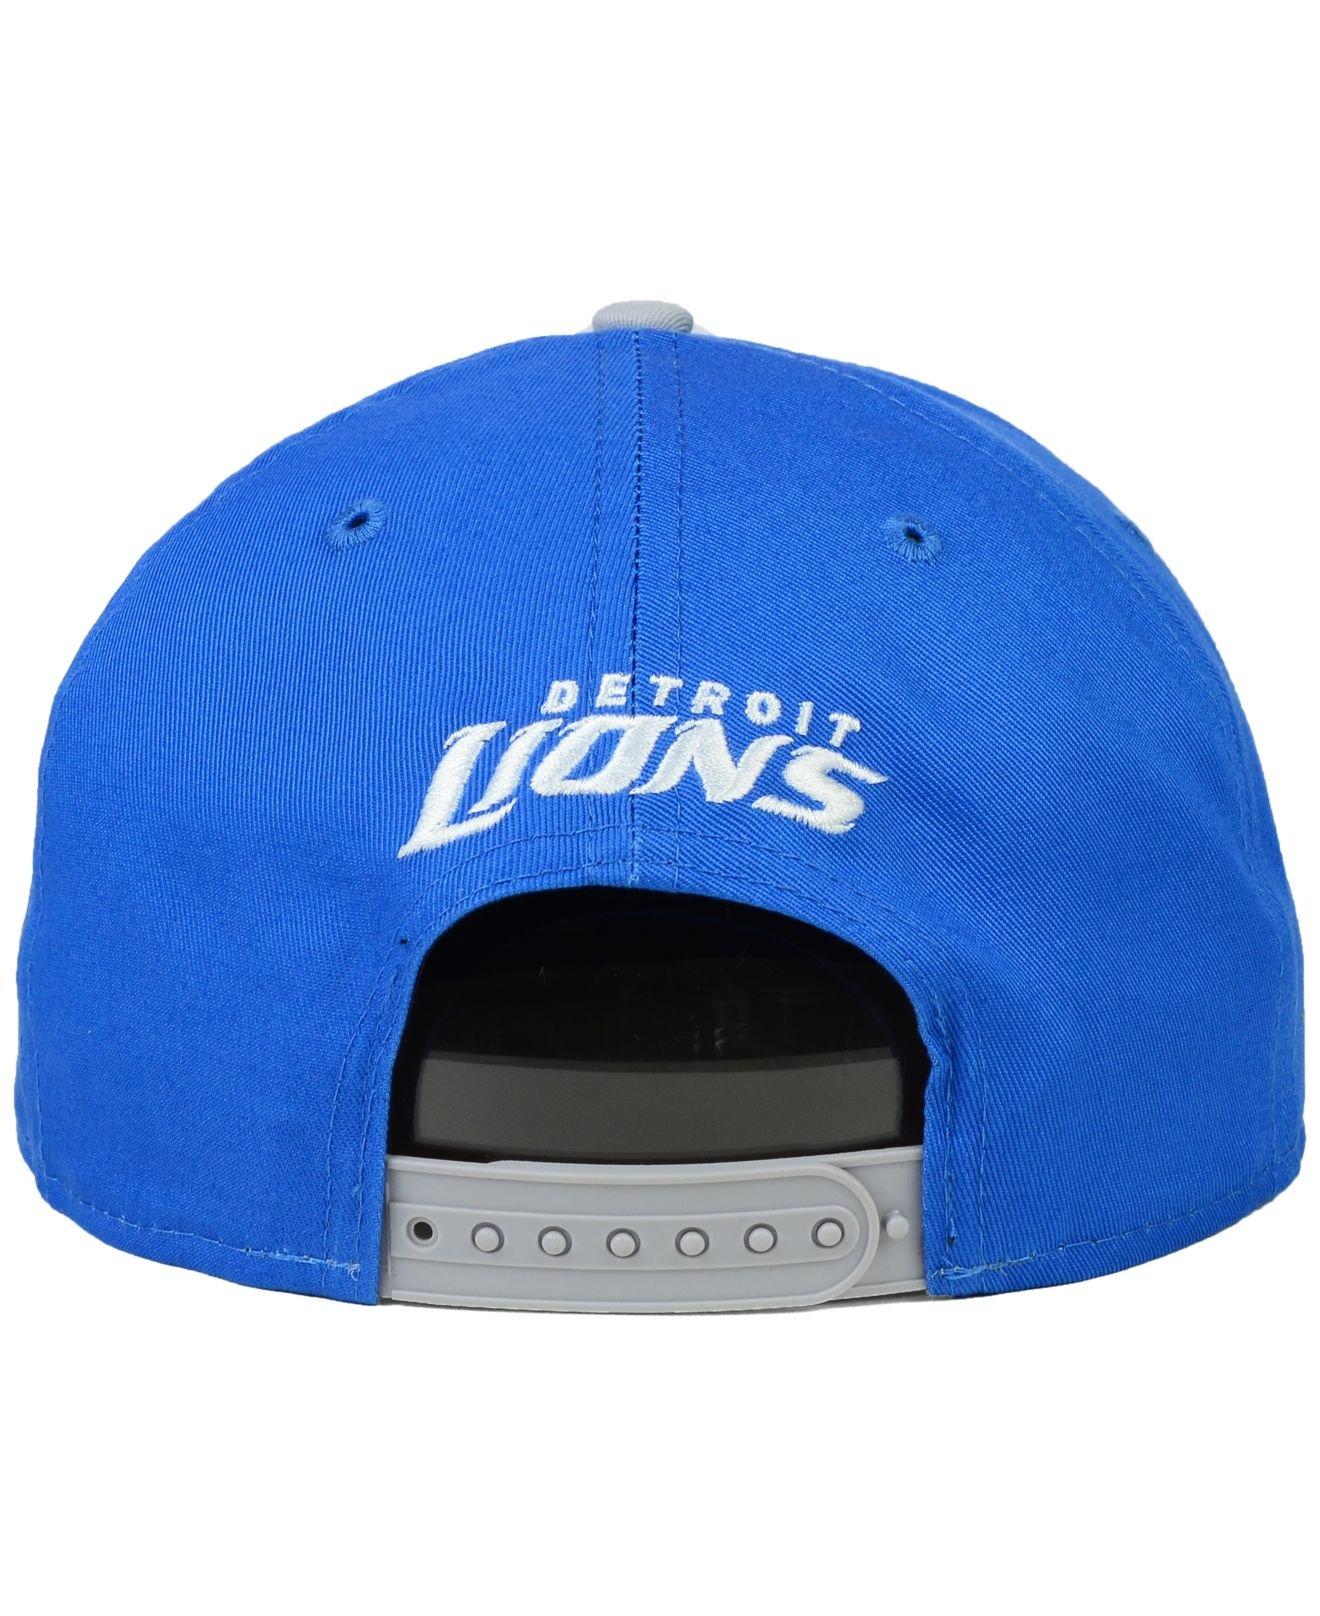 Lyst - Ktz Detroit Lions 2015 Nfl Draft 9fifty Snapback Cap in Blue ... 658a02d29